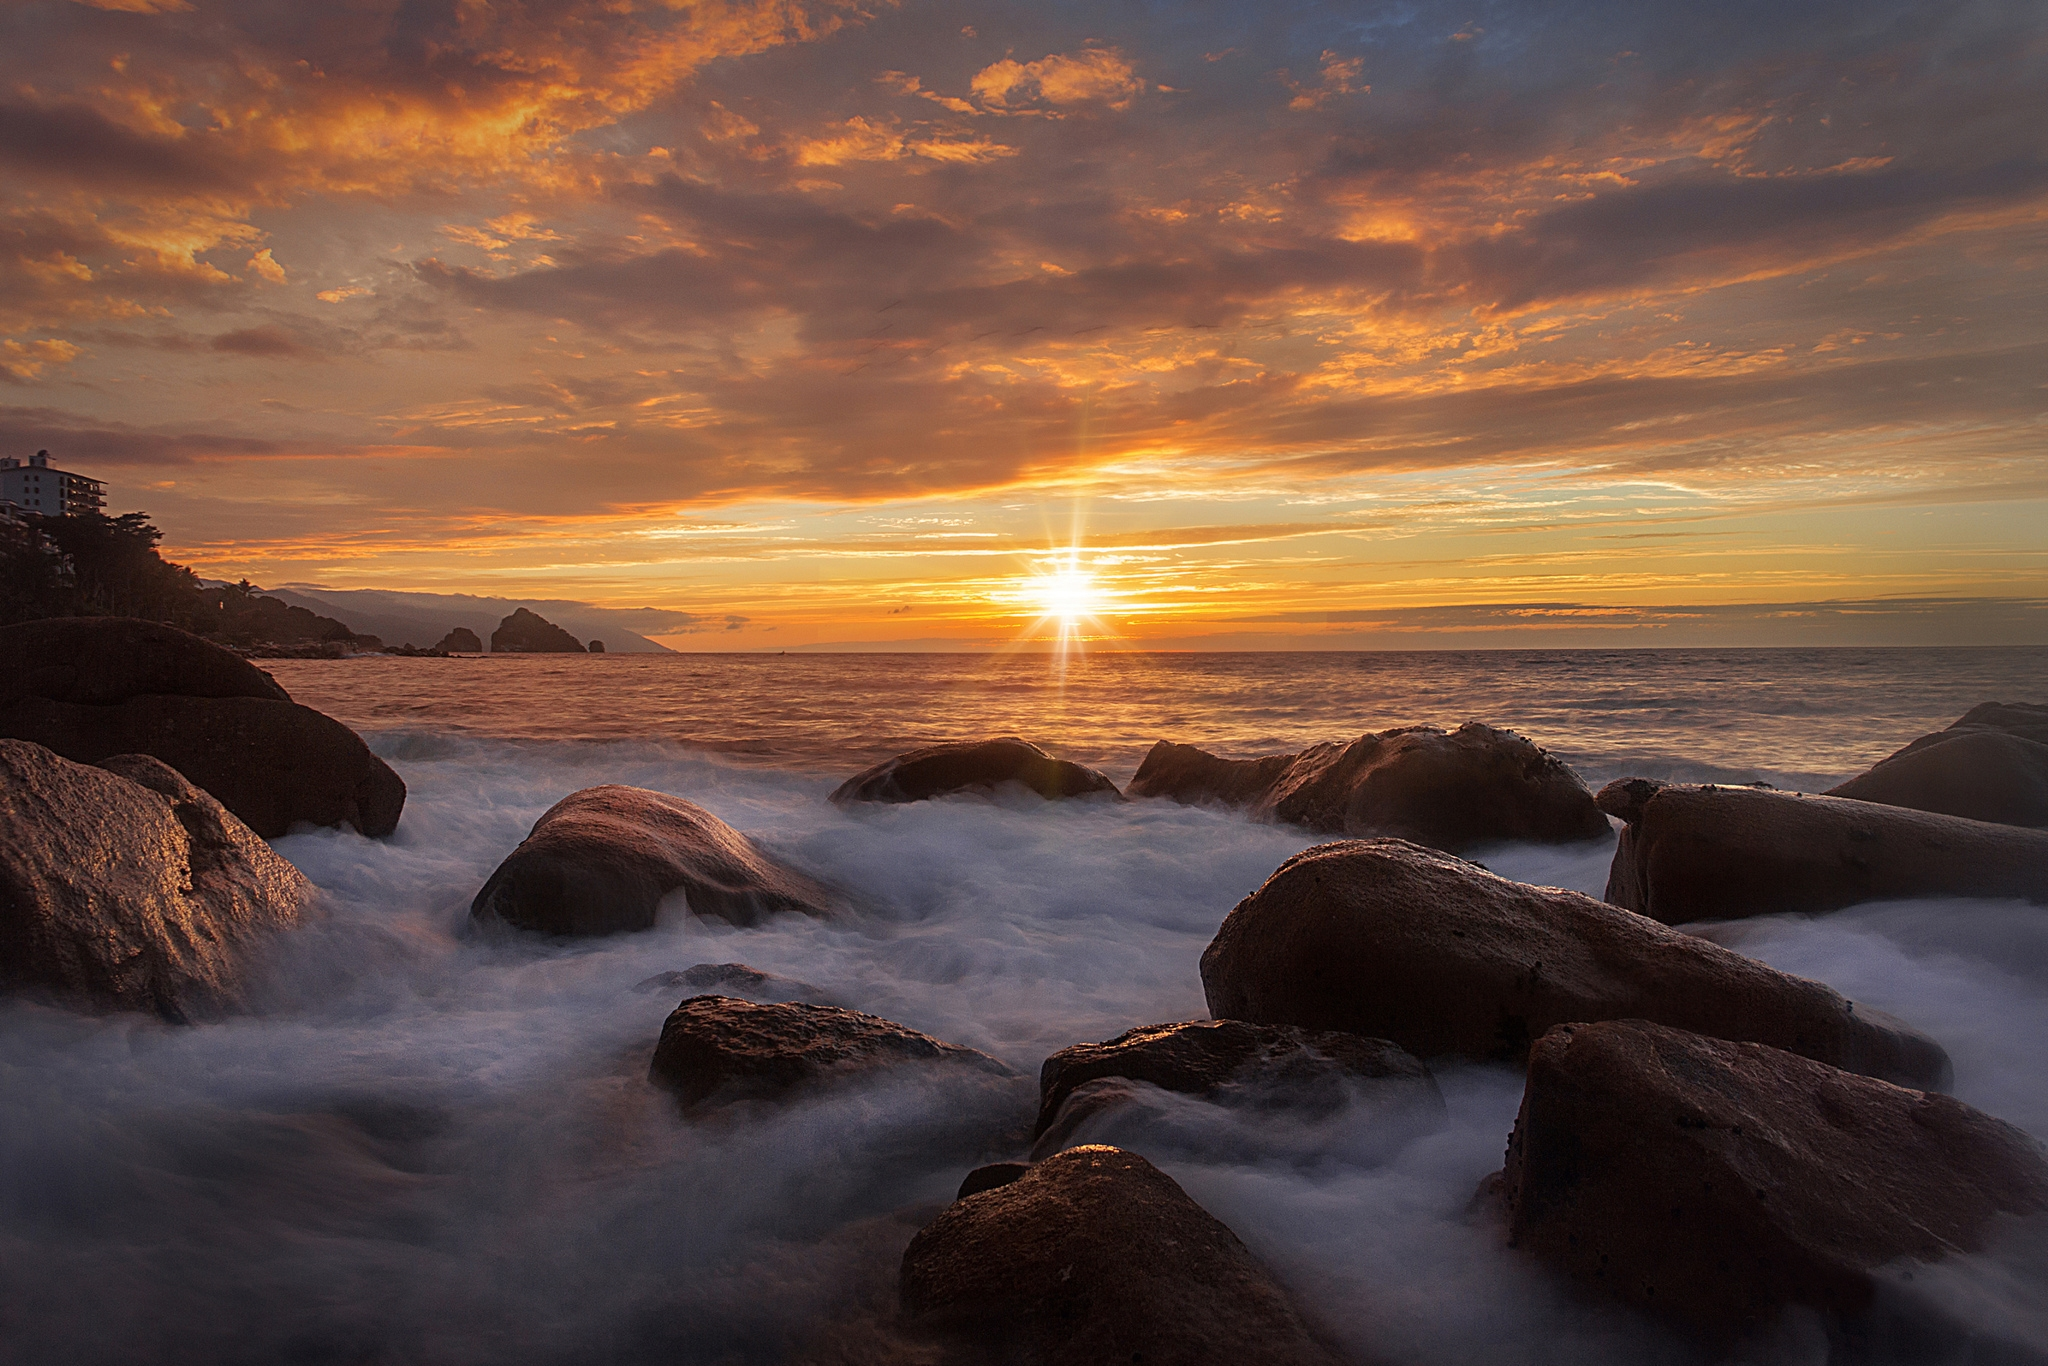 камни закат море бесплатно